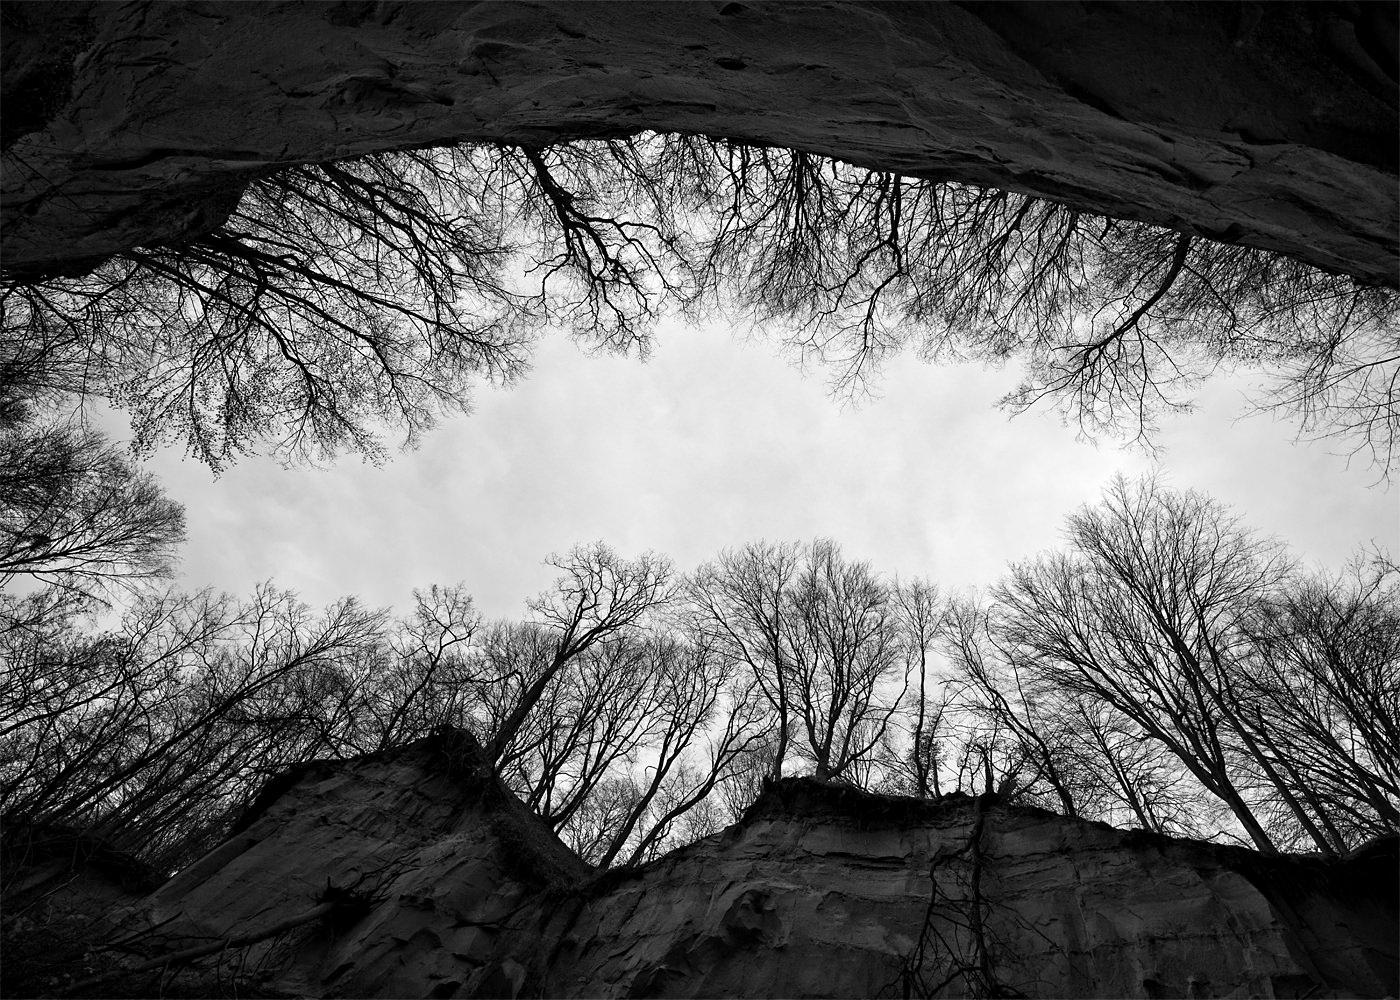 Canionul Mihaileni Sibiu alb negru vedere din interior